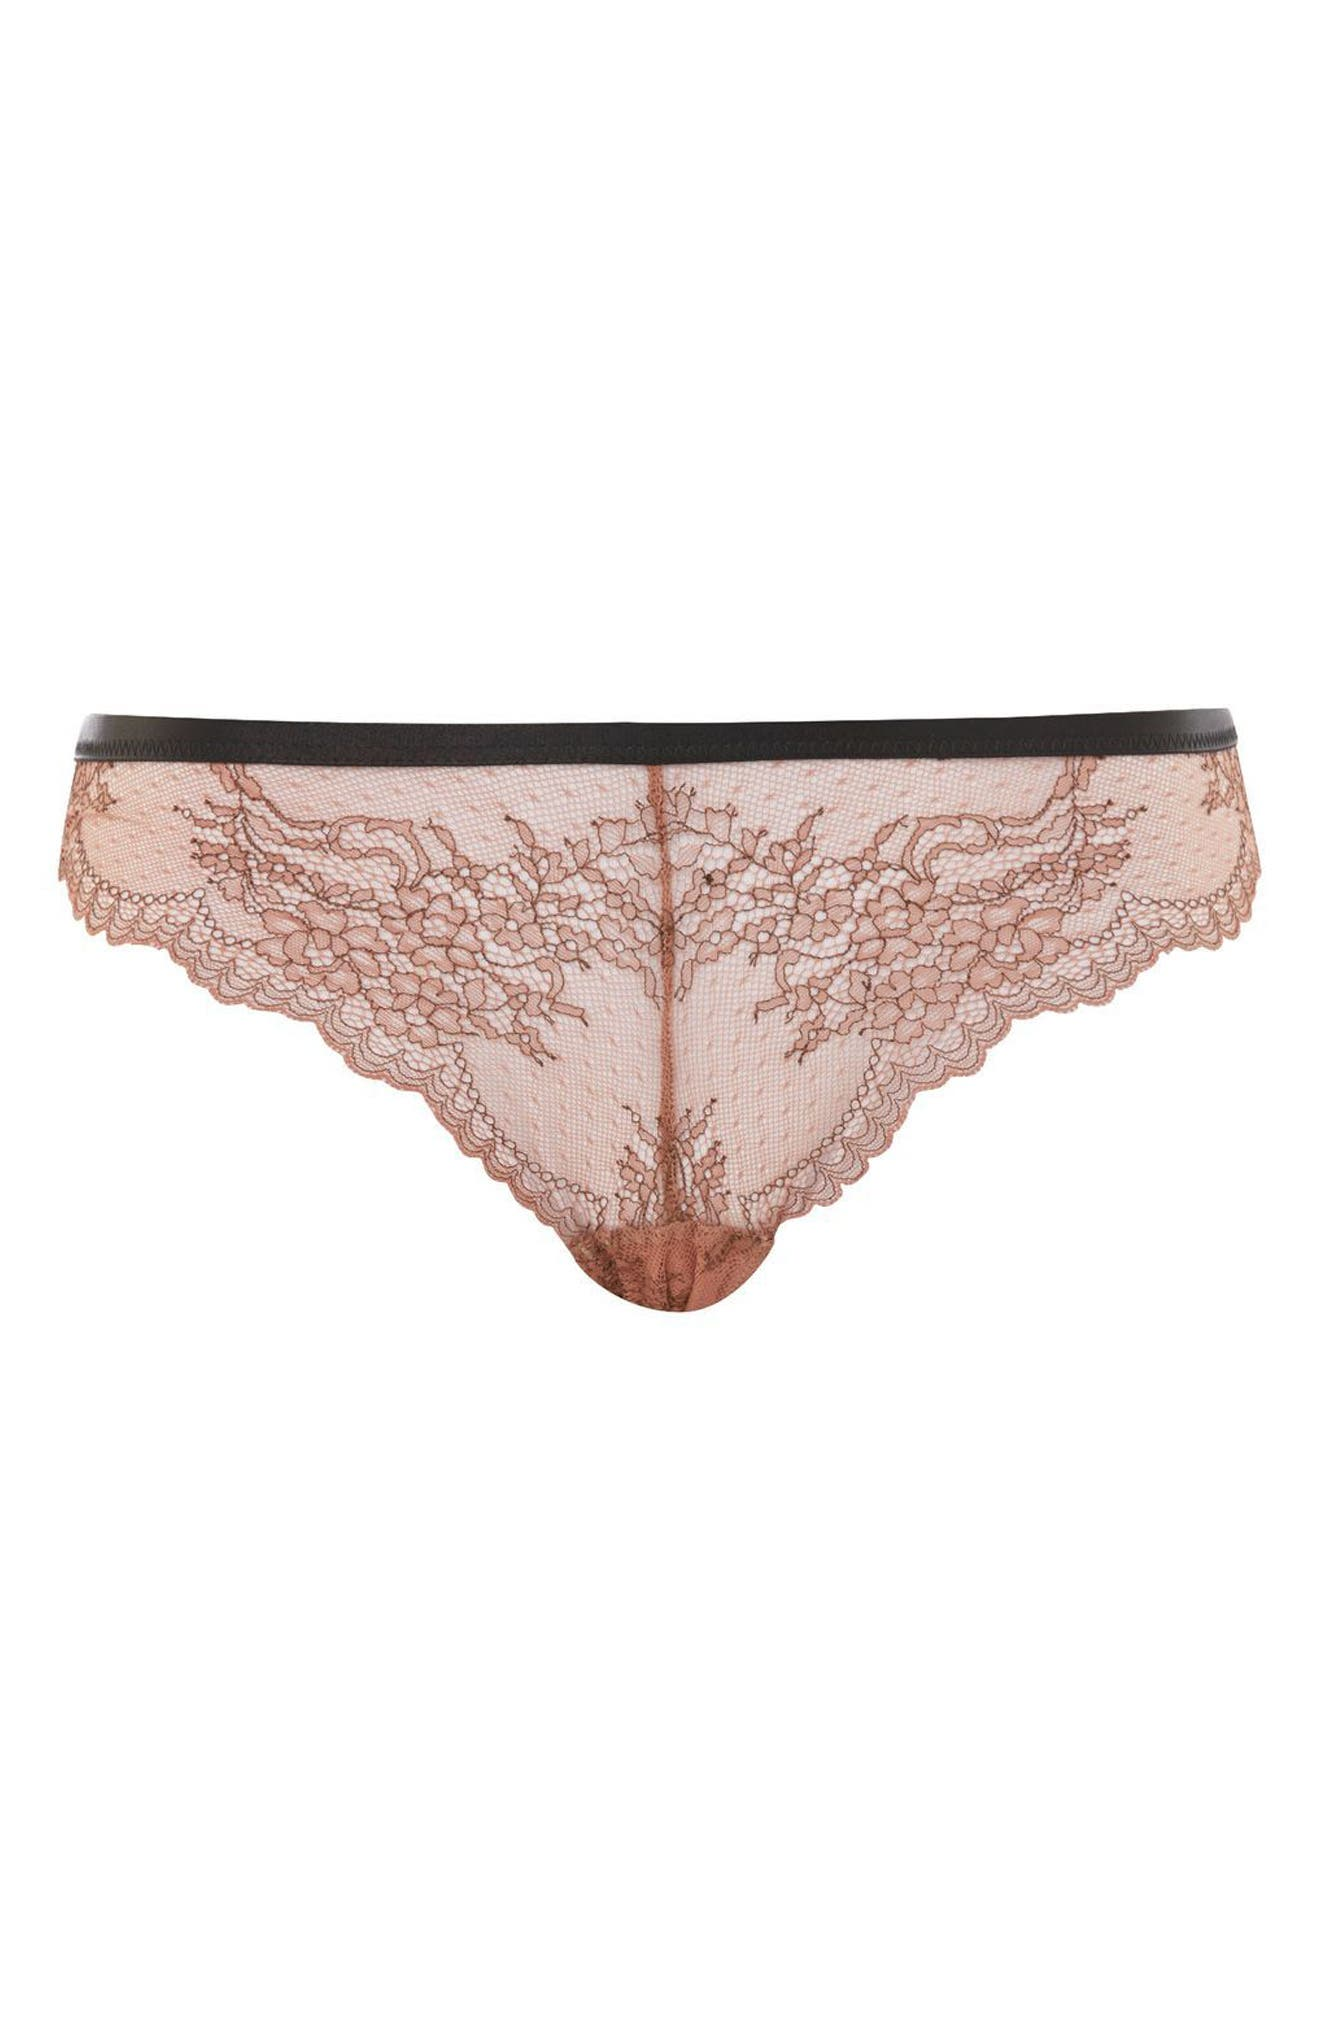 Lila Lace Brazilian Panties,                             Main thumbnail 1, color,                             Nude